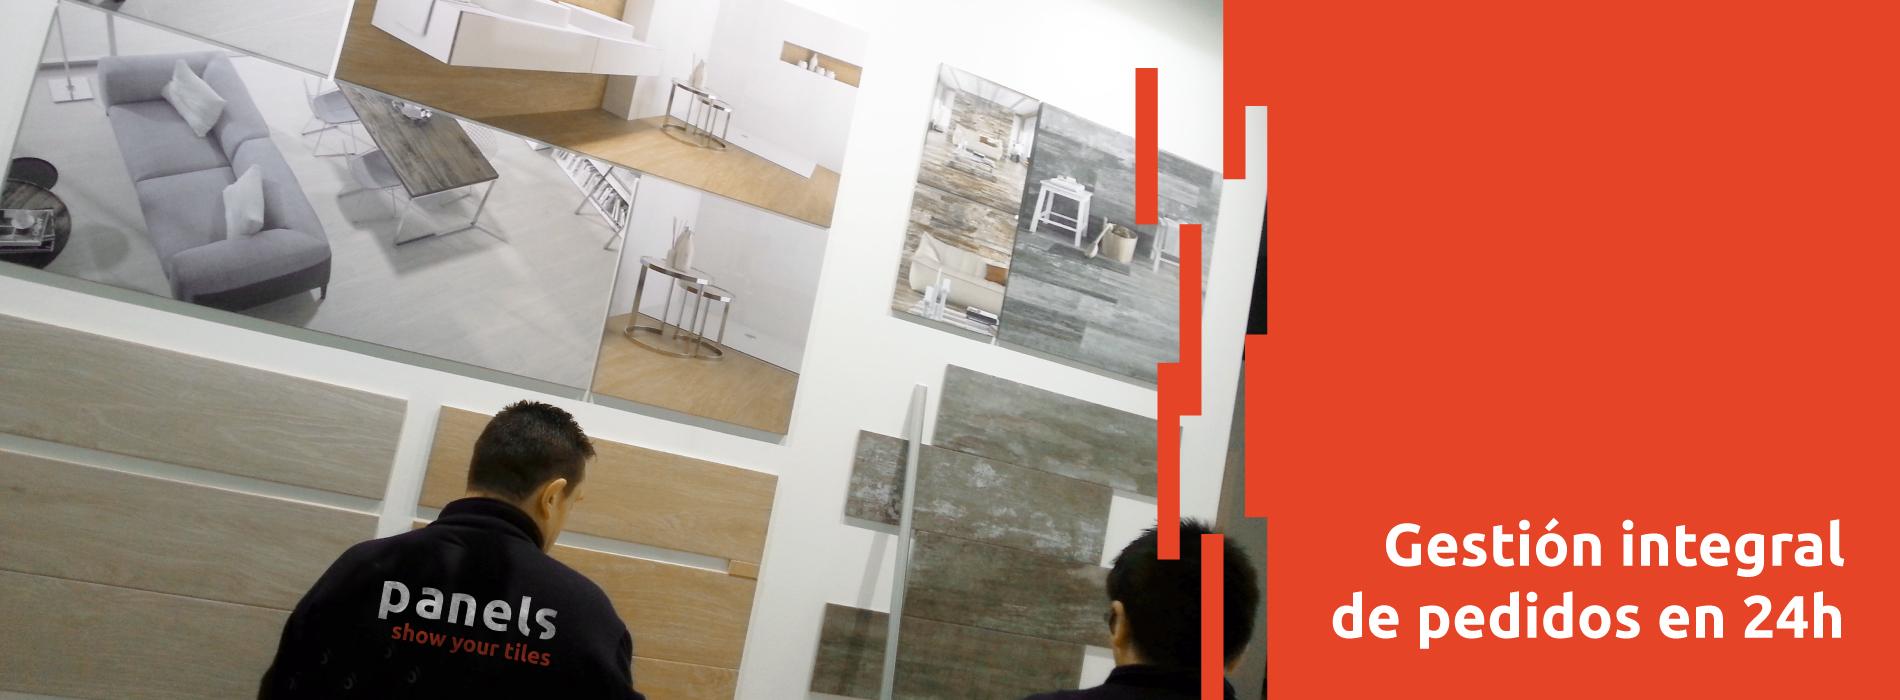 Panels-Slides-1900x700-px-03